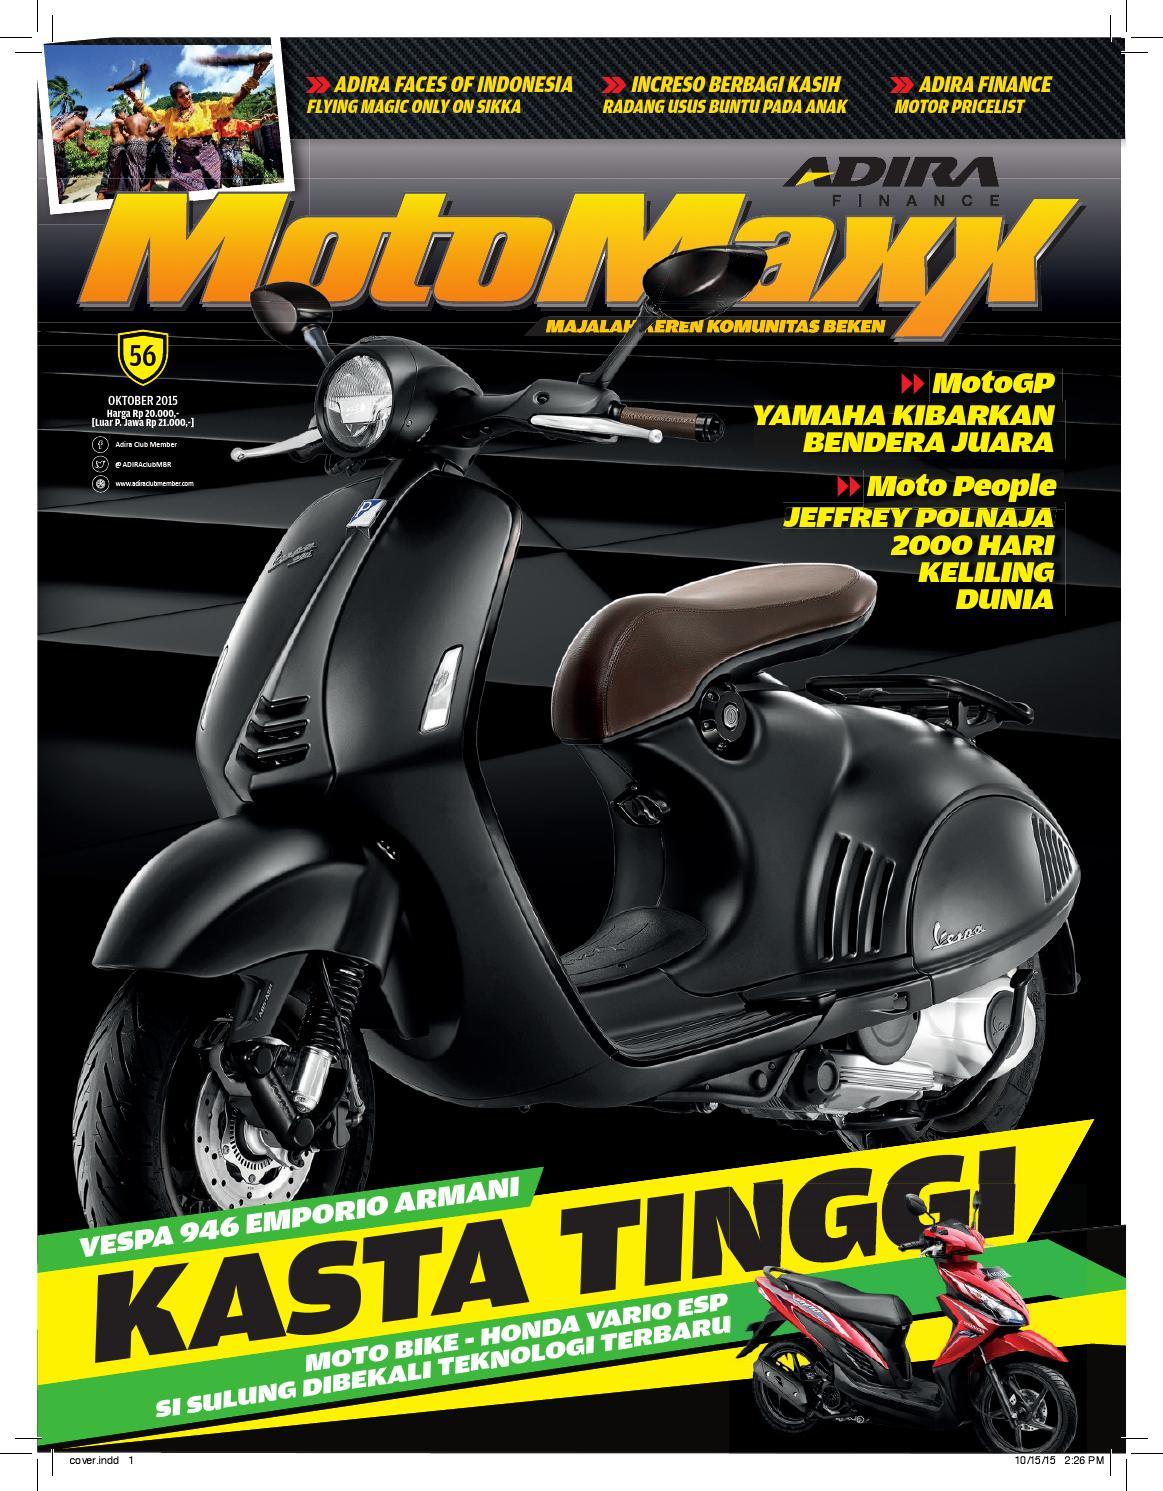 Motomaxx 04 2013 By Adira Member Issuu New Supra X 125 Fi Cast Wheel Energetic Red Kota Semarang 10 2015